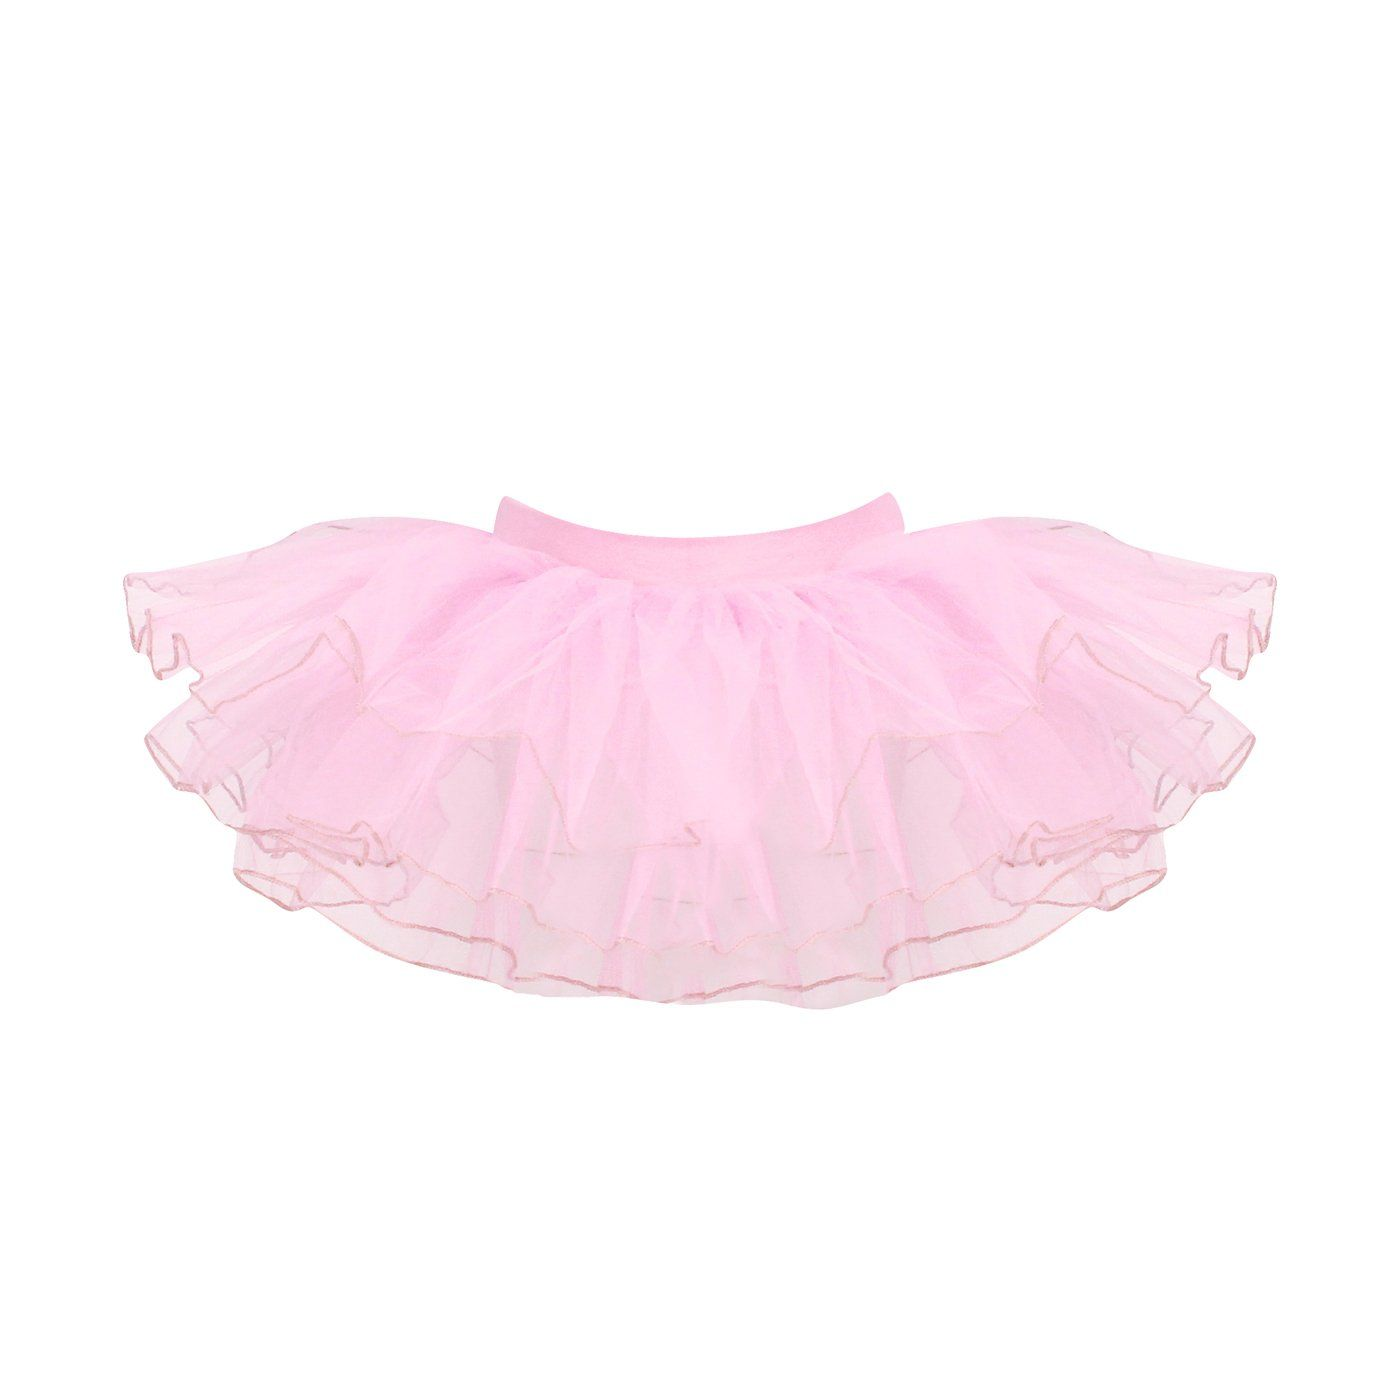 tamaño VENI MASEE 7/10 niñas de varias capas de la falda del tutú de ...